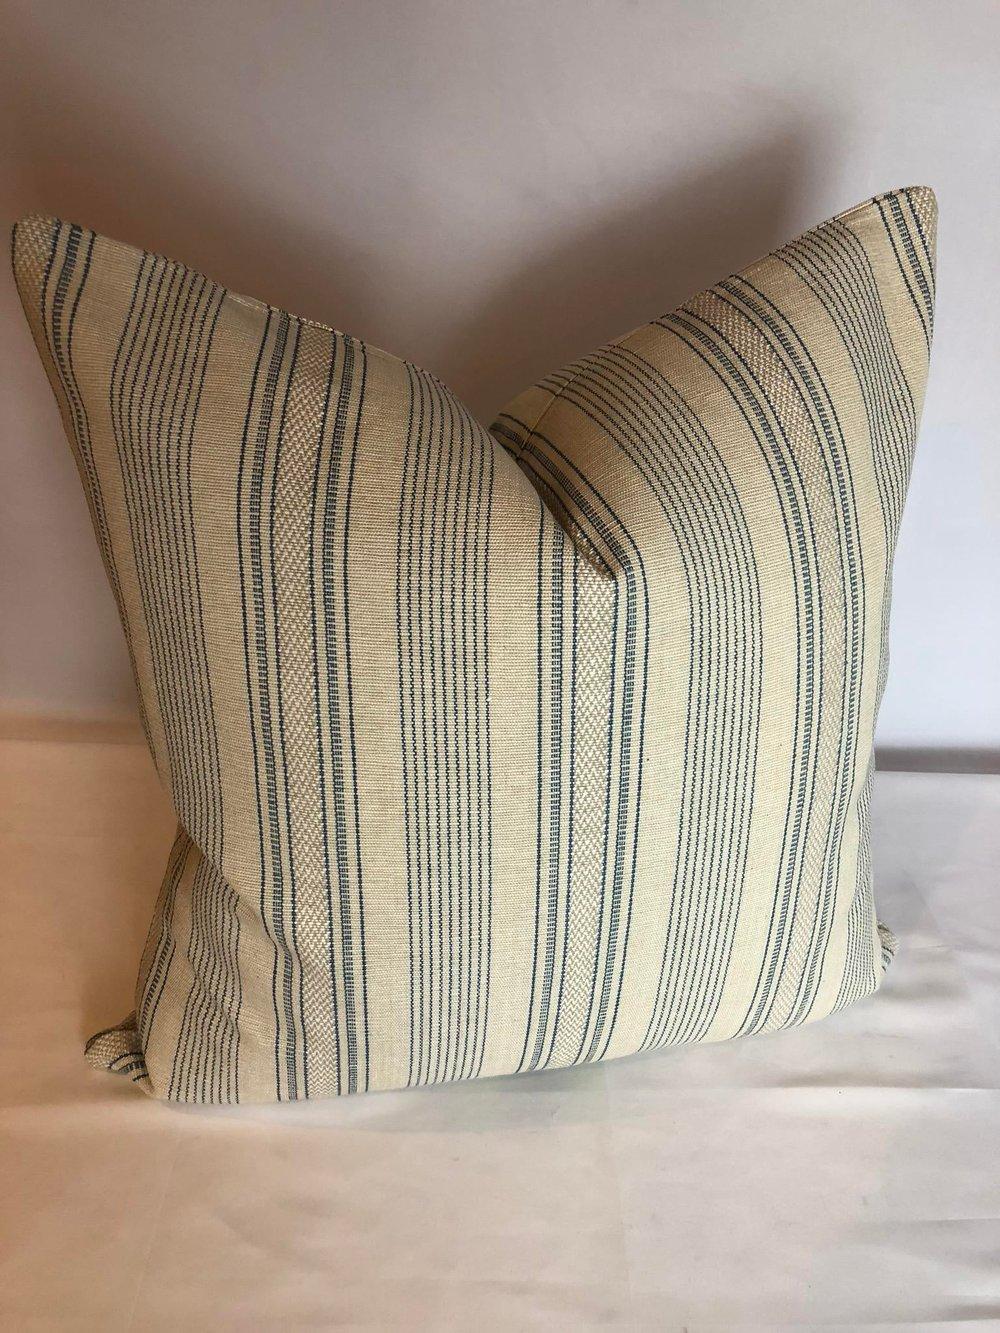 Cowtan & Tout Woven Transitional Stripe Designer Pillow With 90/10 Down Insert